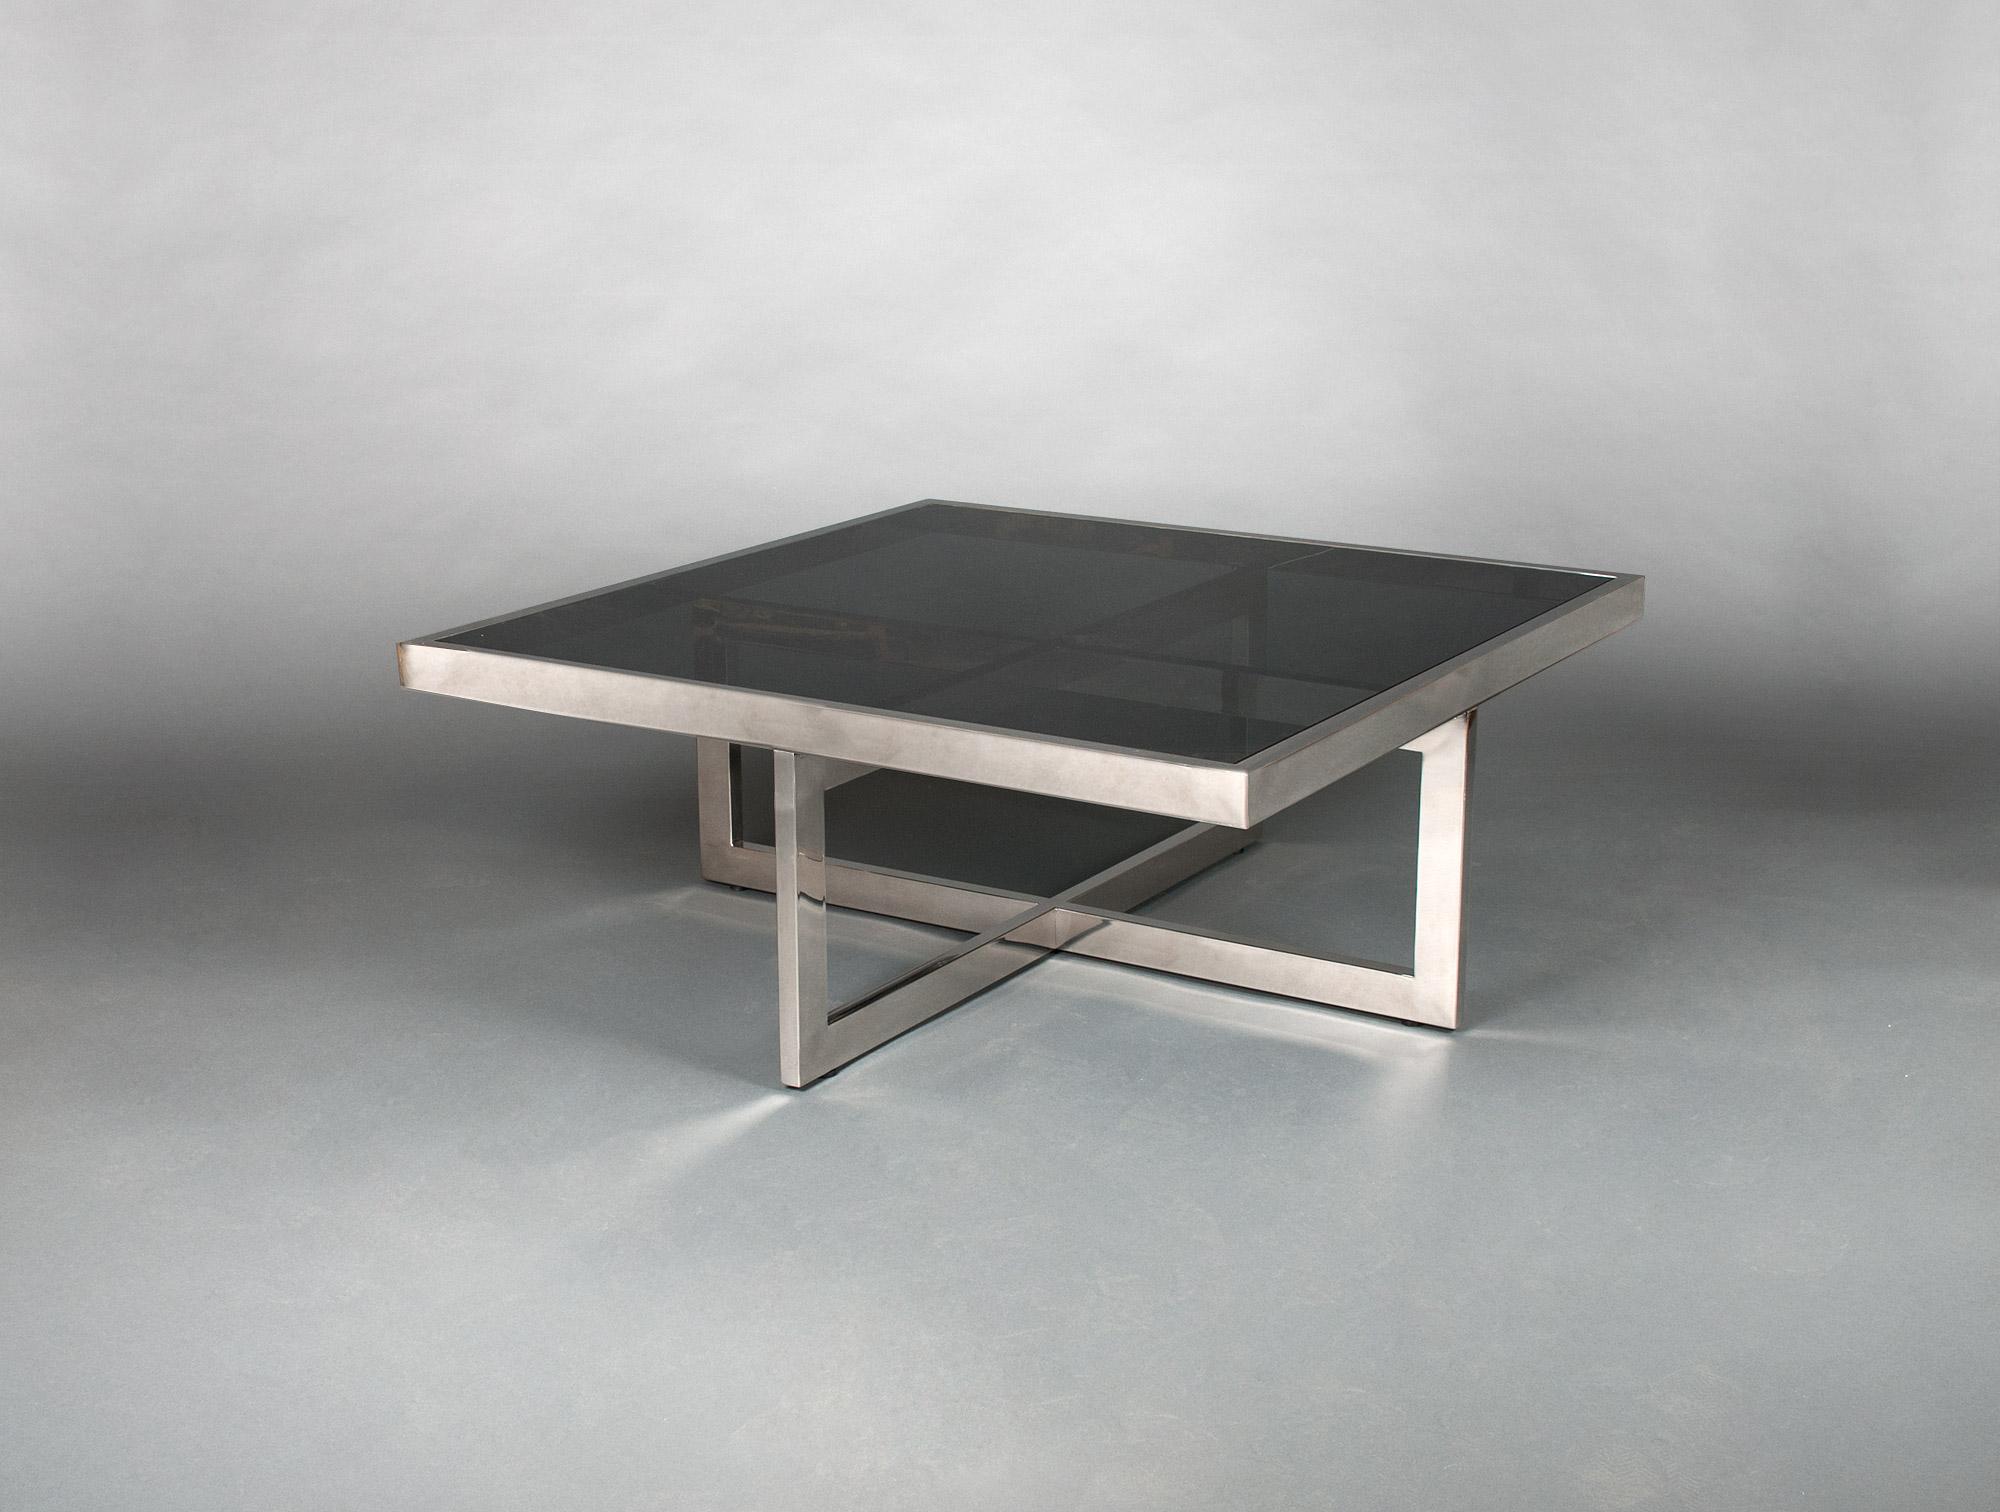 grande table basse soubrier louer tables bureaux table basse xxe. Black Bedroom Furniture Sets. Home Design Ideas